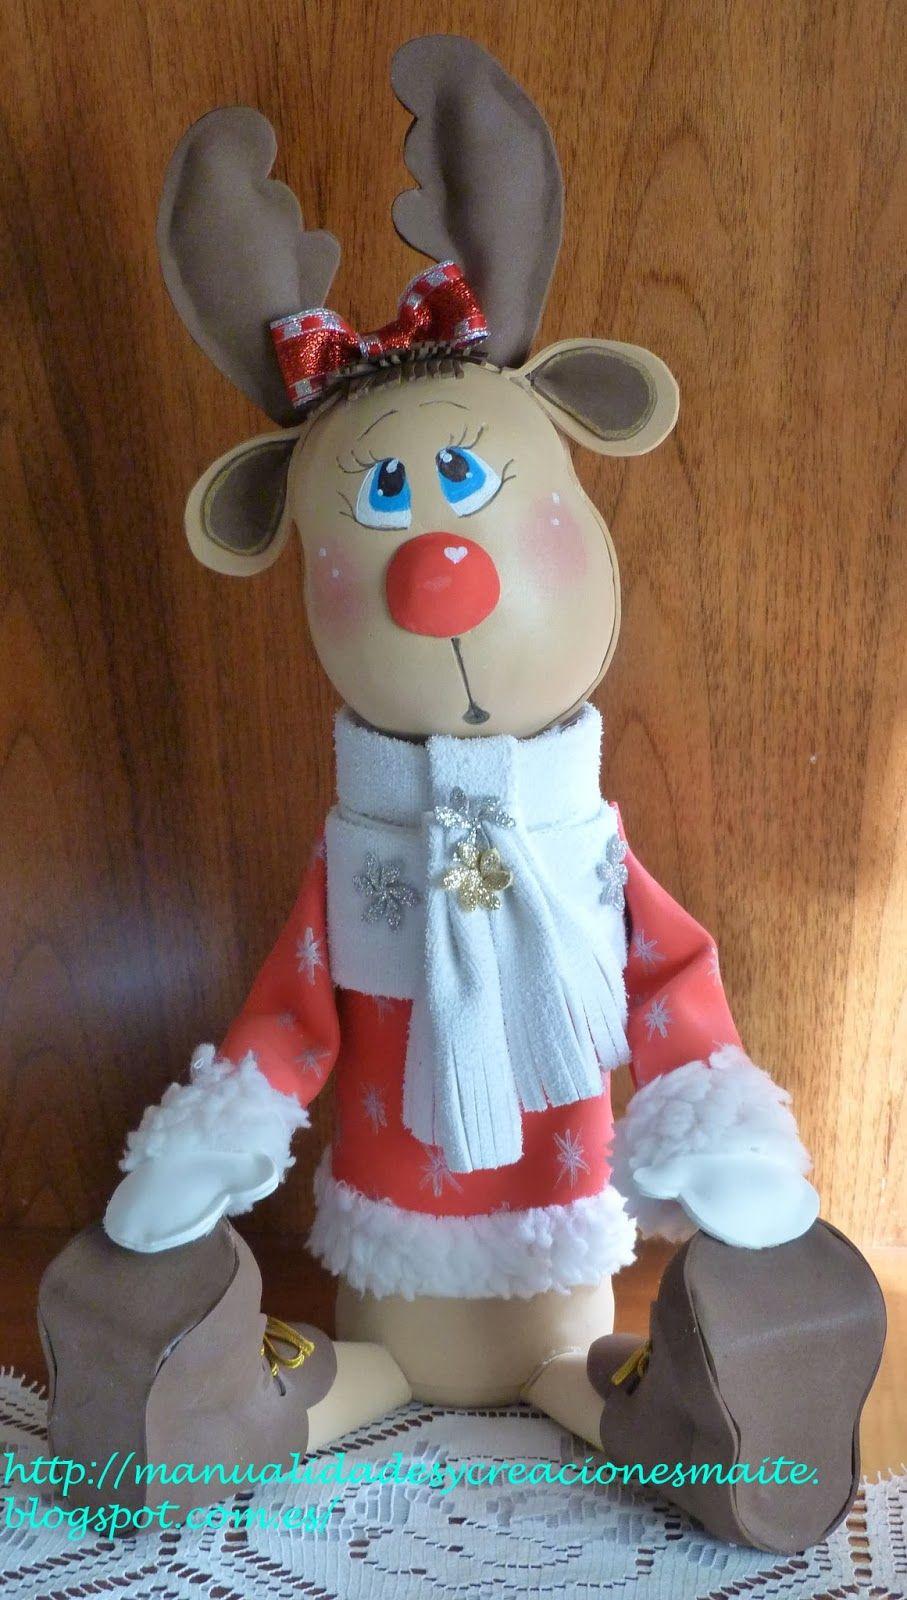 Fofuchas manualidades y creaciones maite adornos navidad for Manualidades renos navidenos